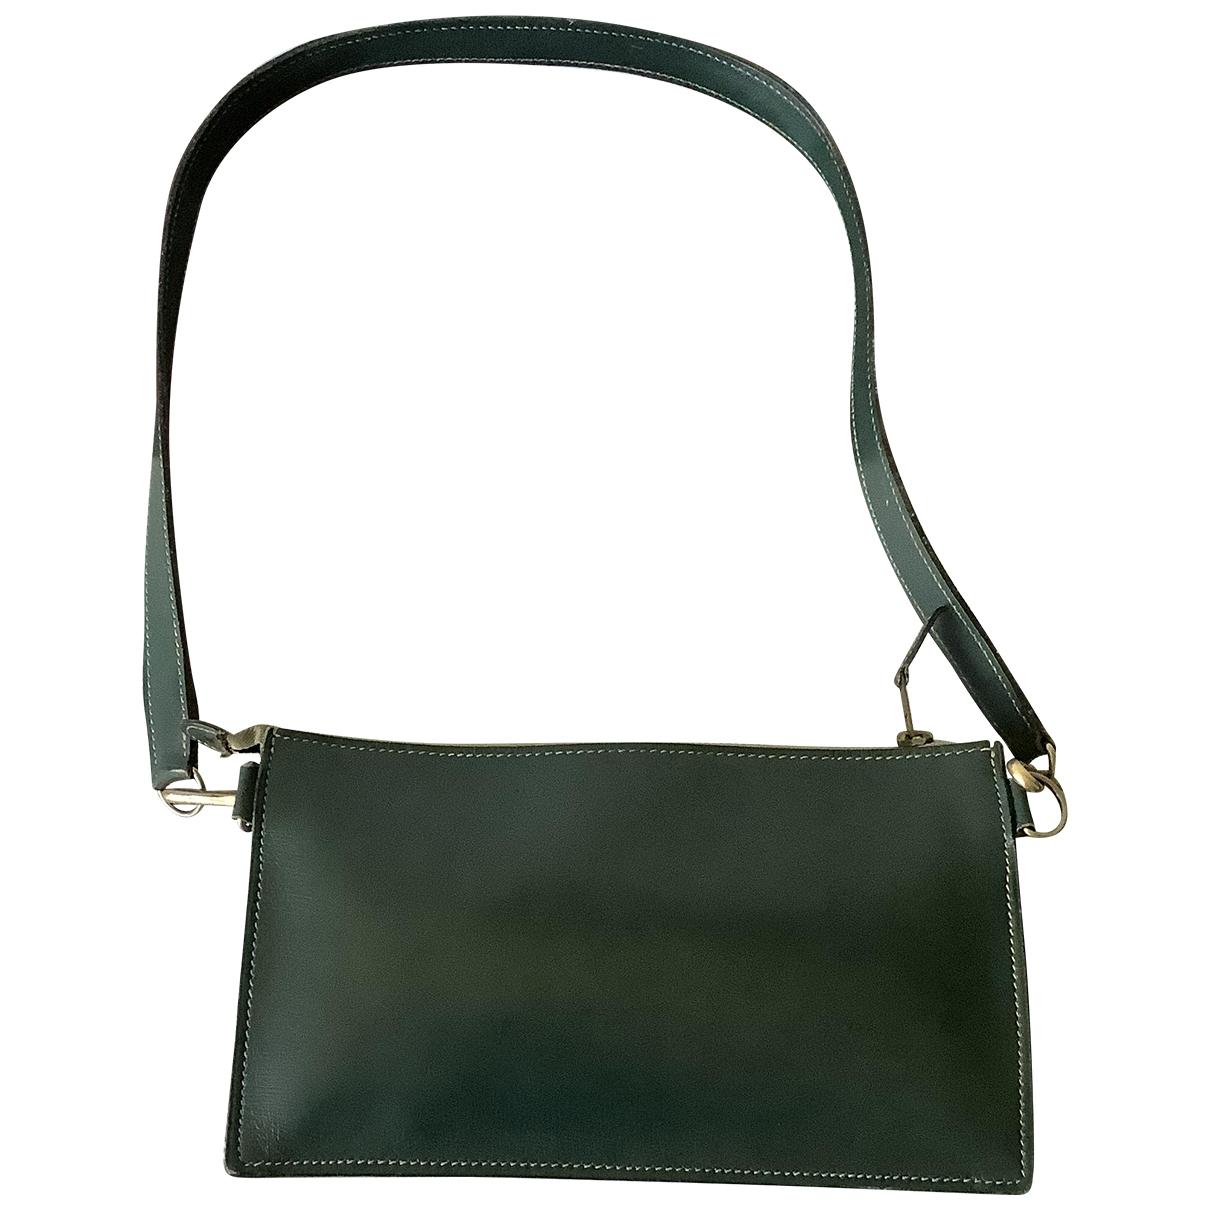 Hermes \N Handtasche in  Gruen Leder